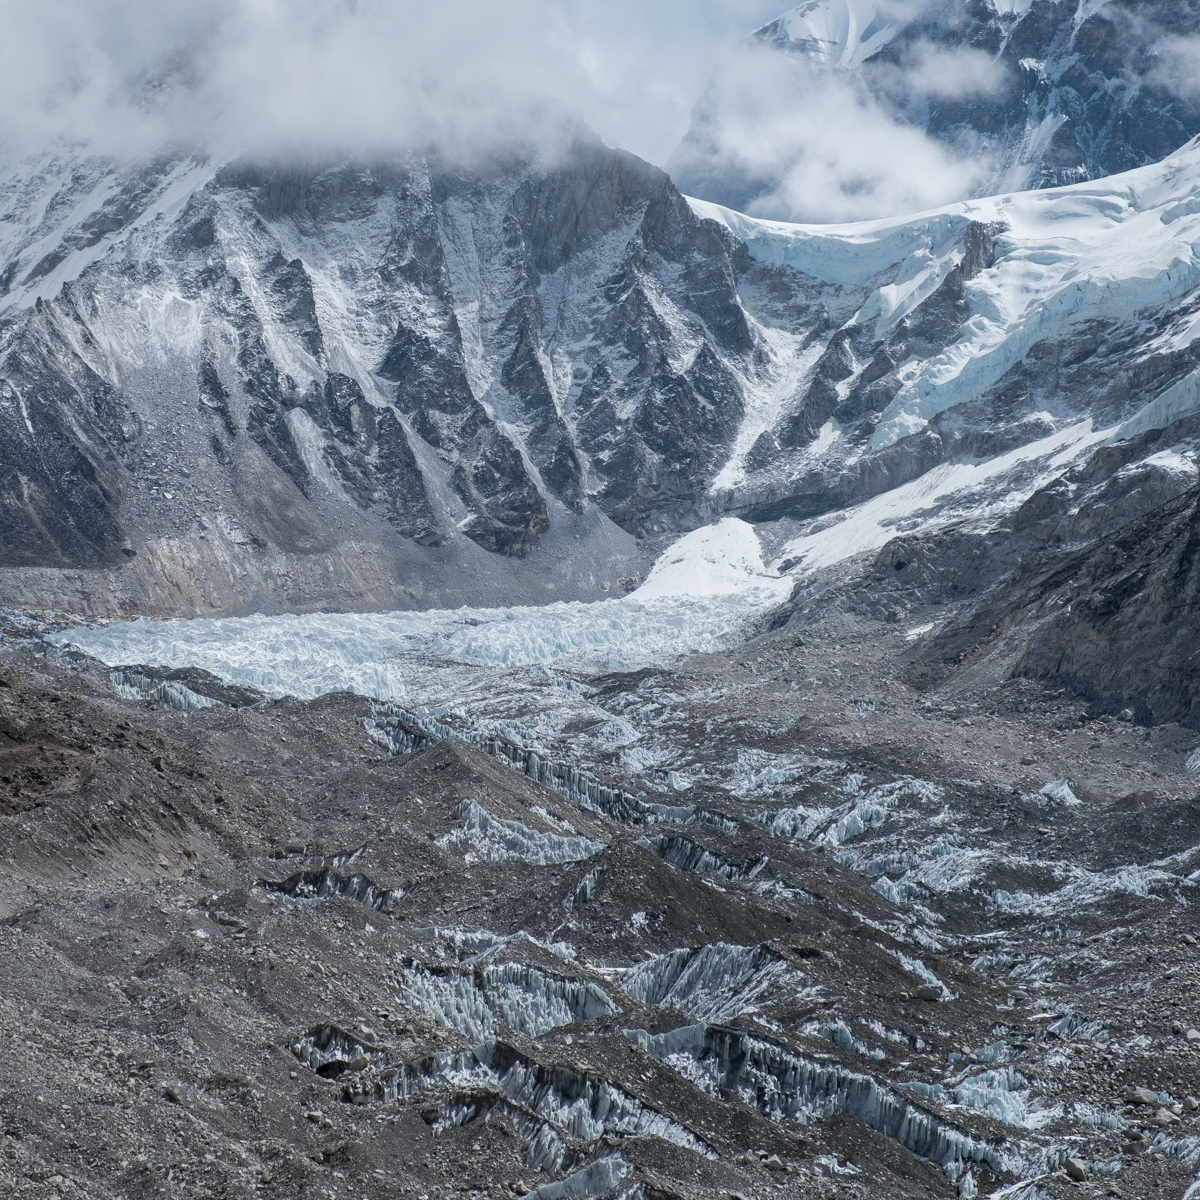 The Khumbu Glacier, Nepal Himalayas.